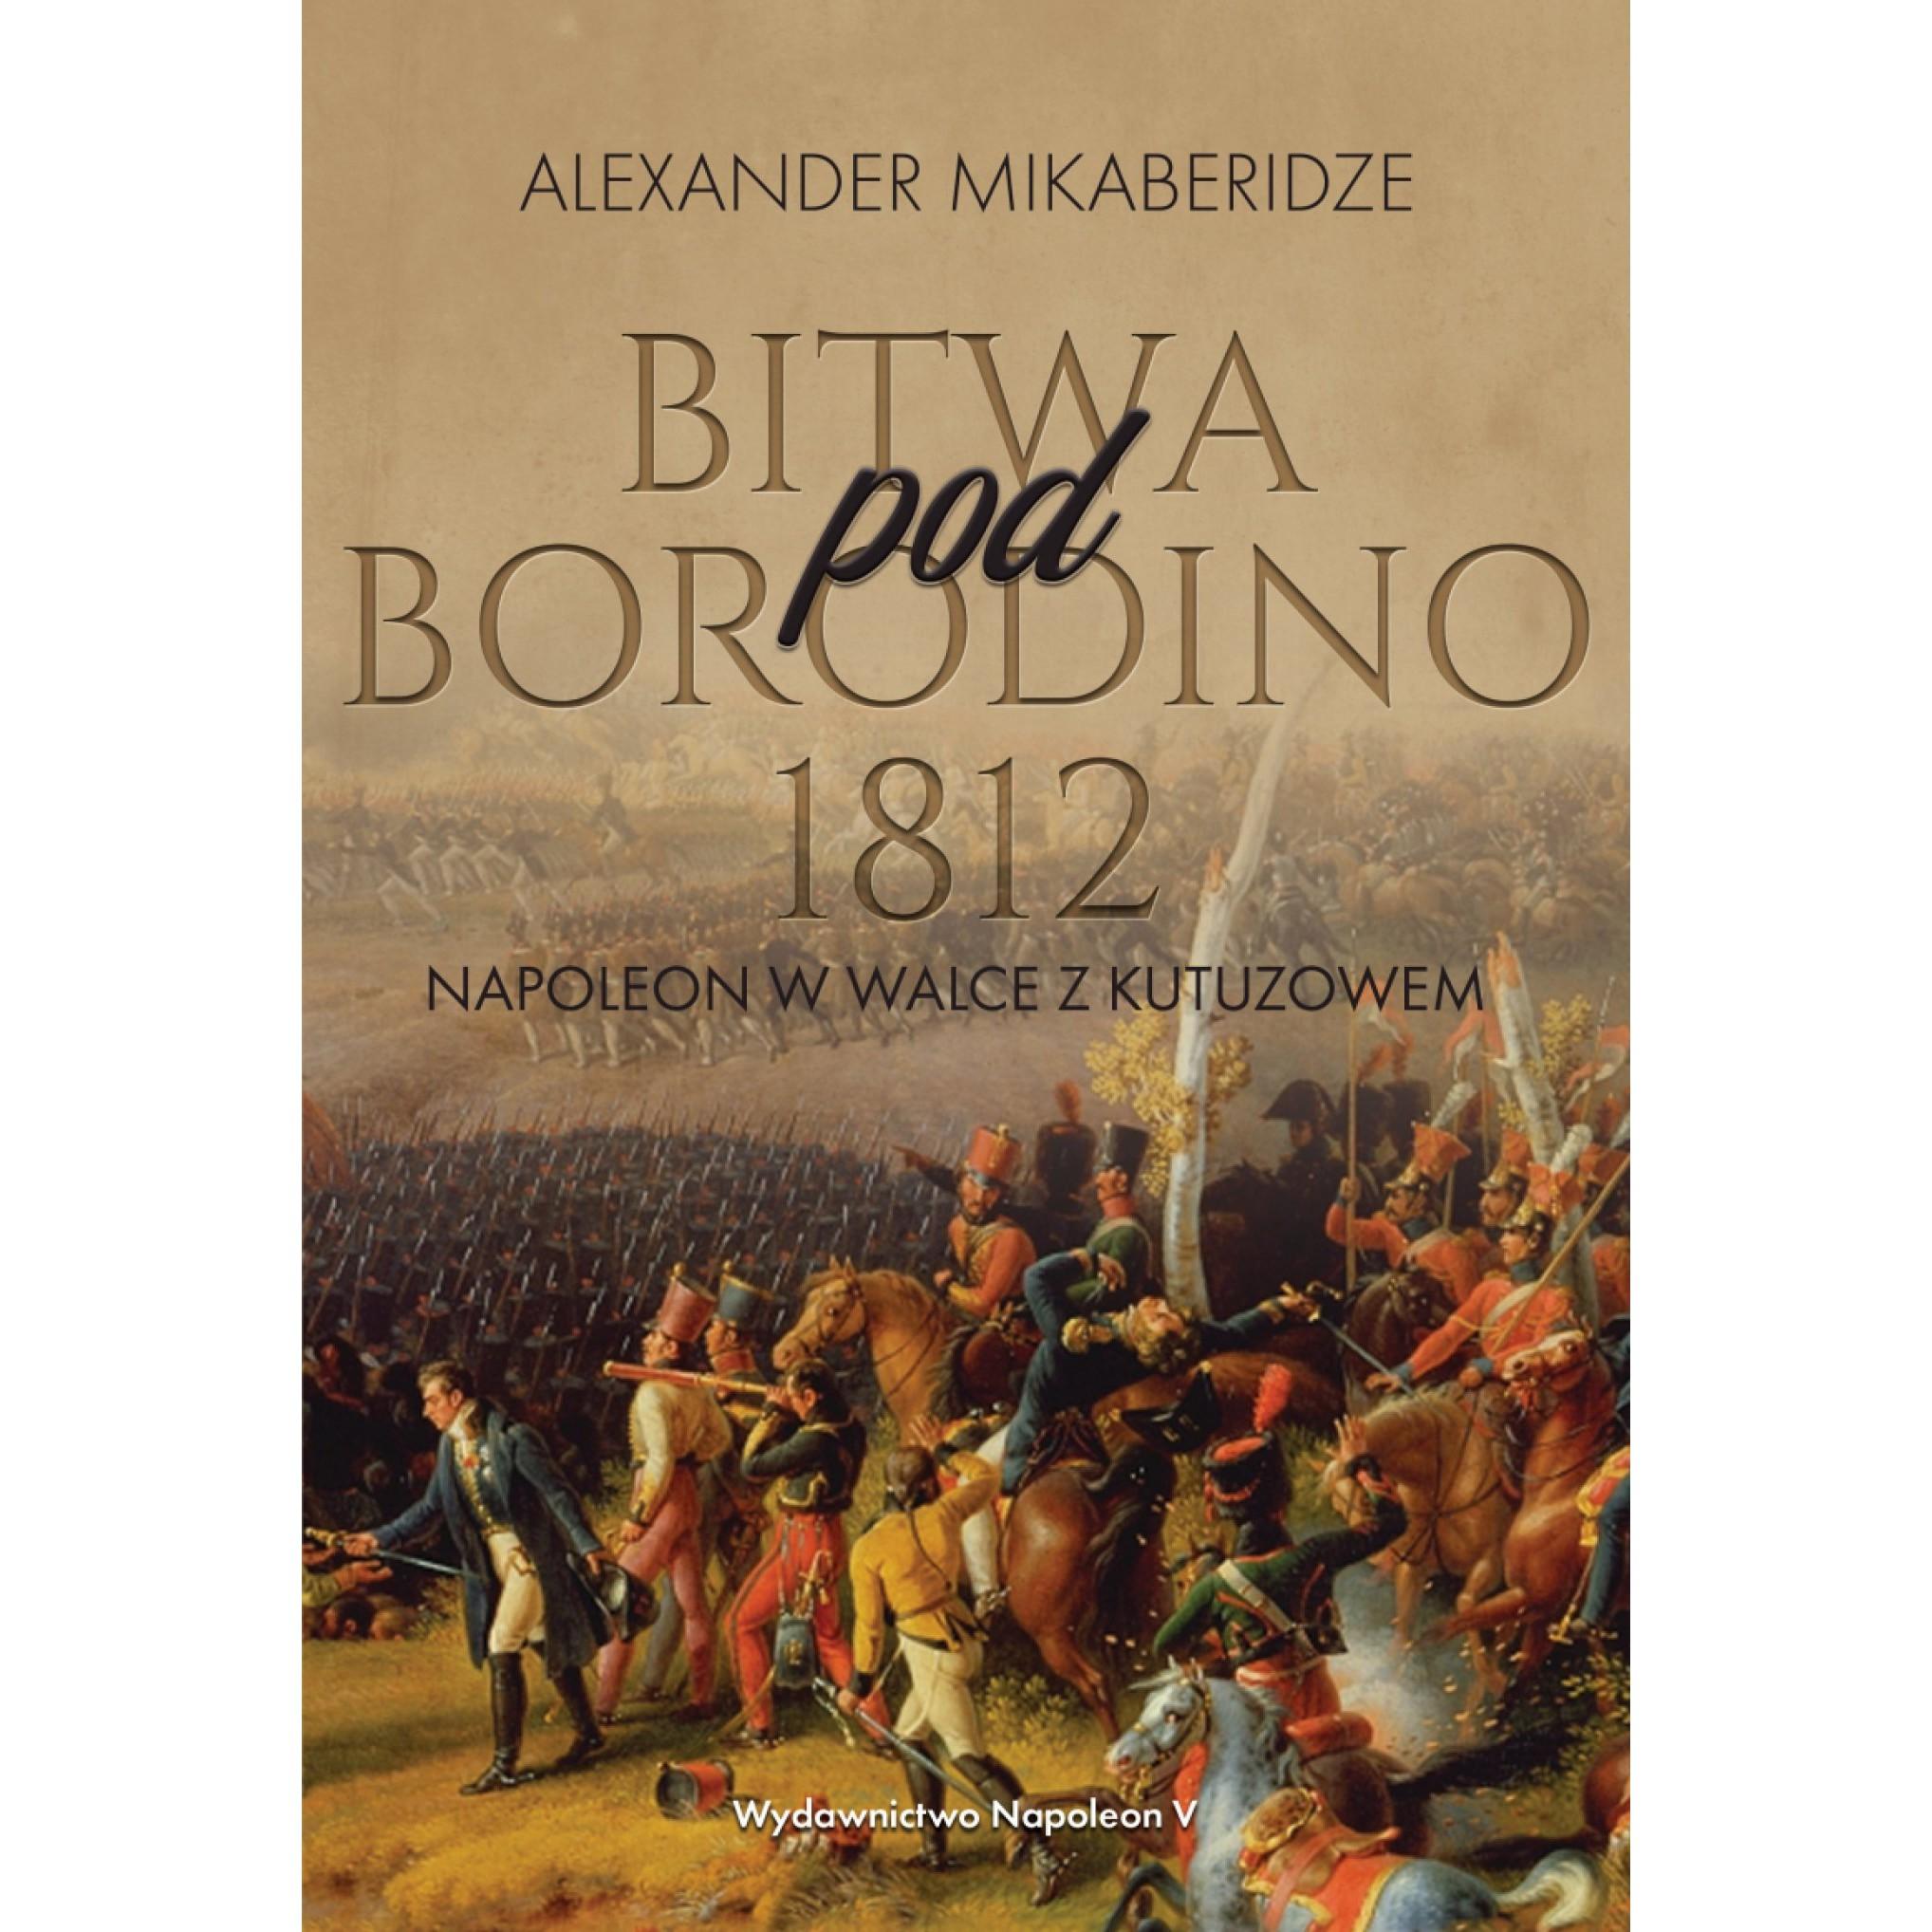 Bitwa pod Borodino 1812. Napoleon w walce z Kutuzowem